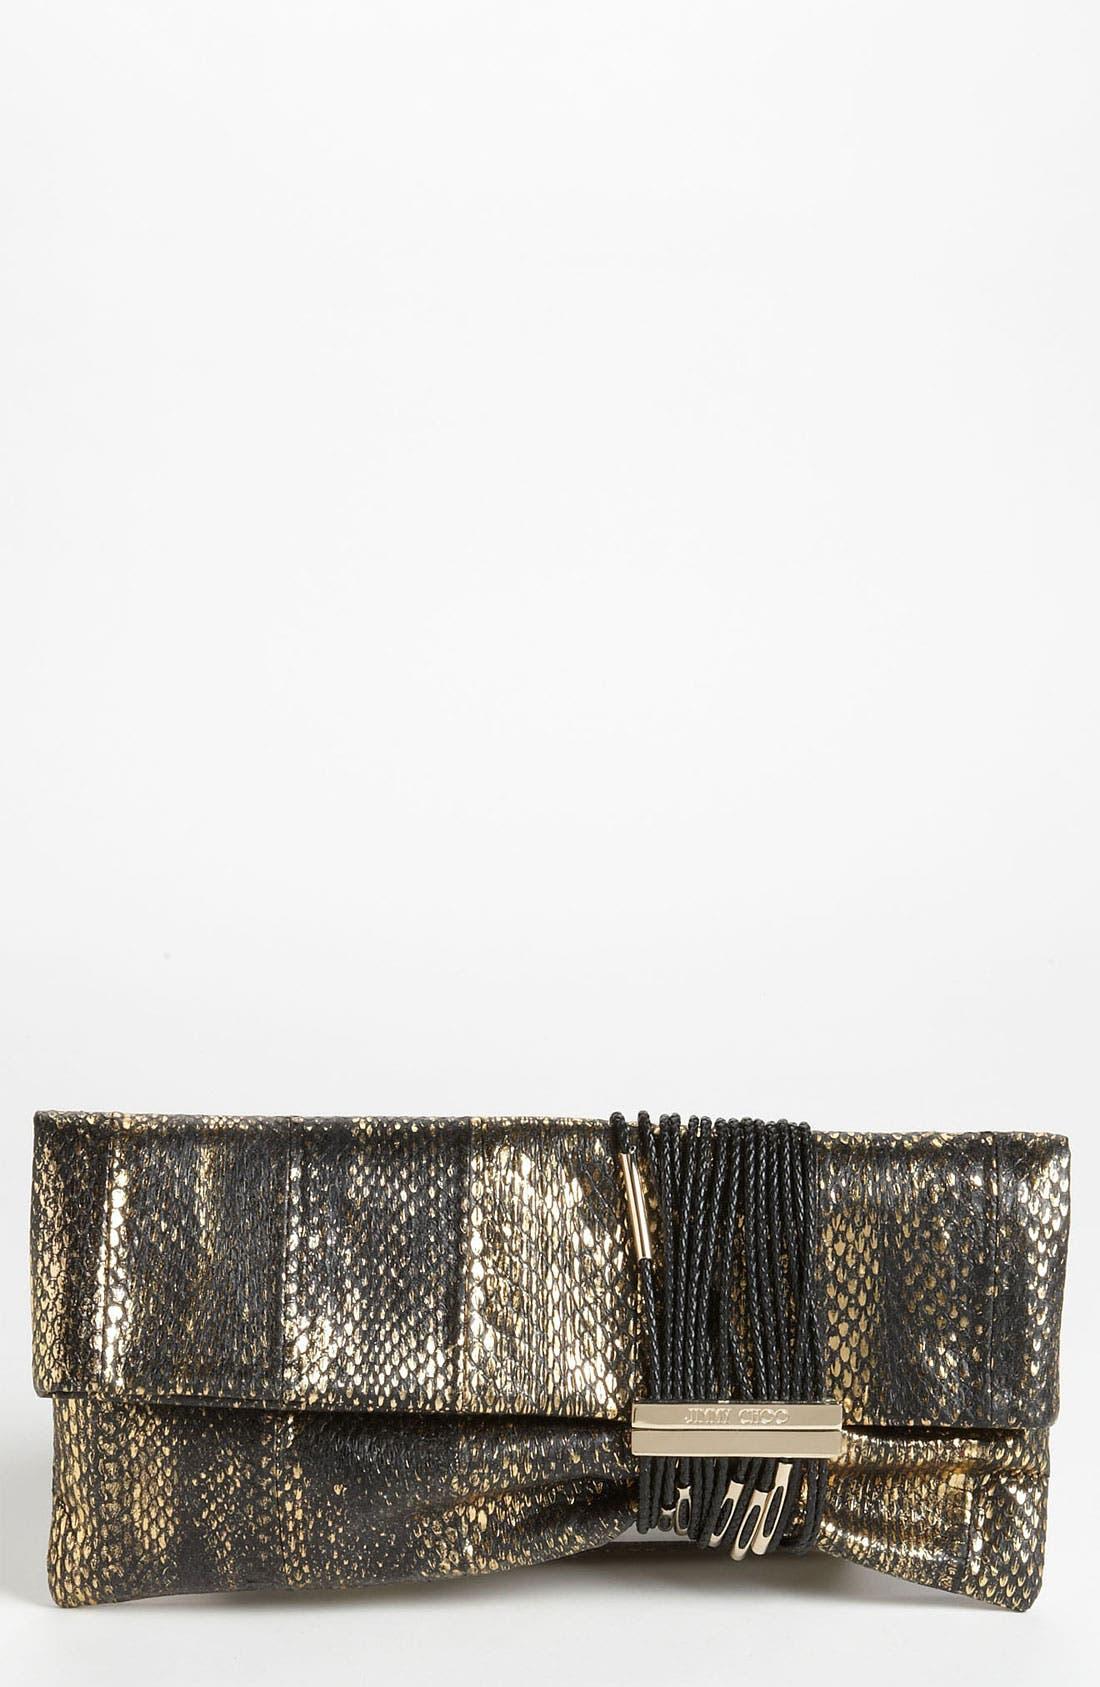 Alternate Image 1 Selected - Jimmy Choo 'Chandra Elaphe' Genuine Snakeskin Clutch